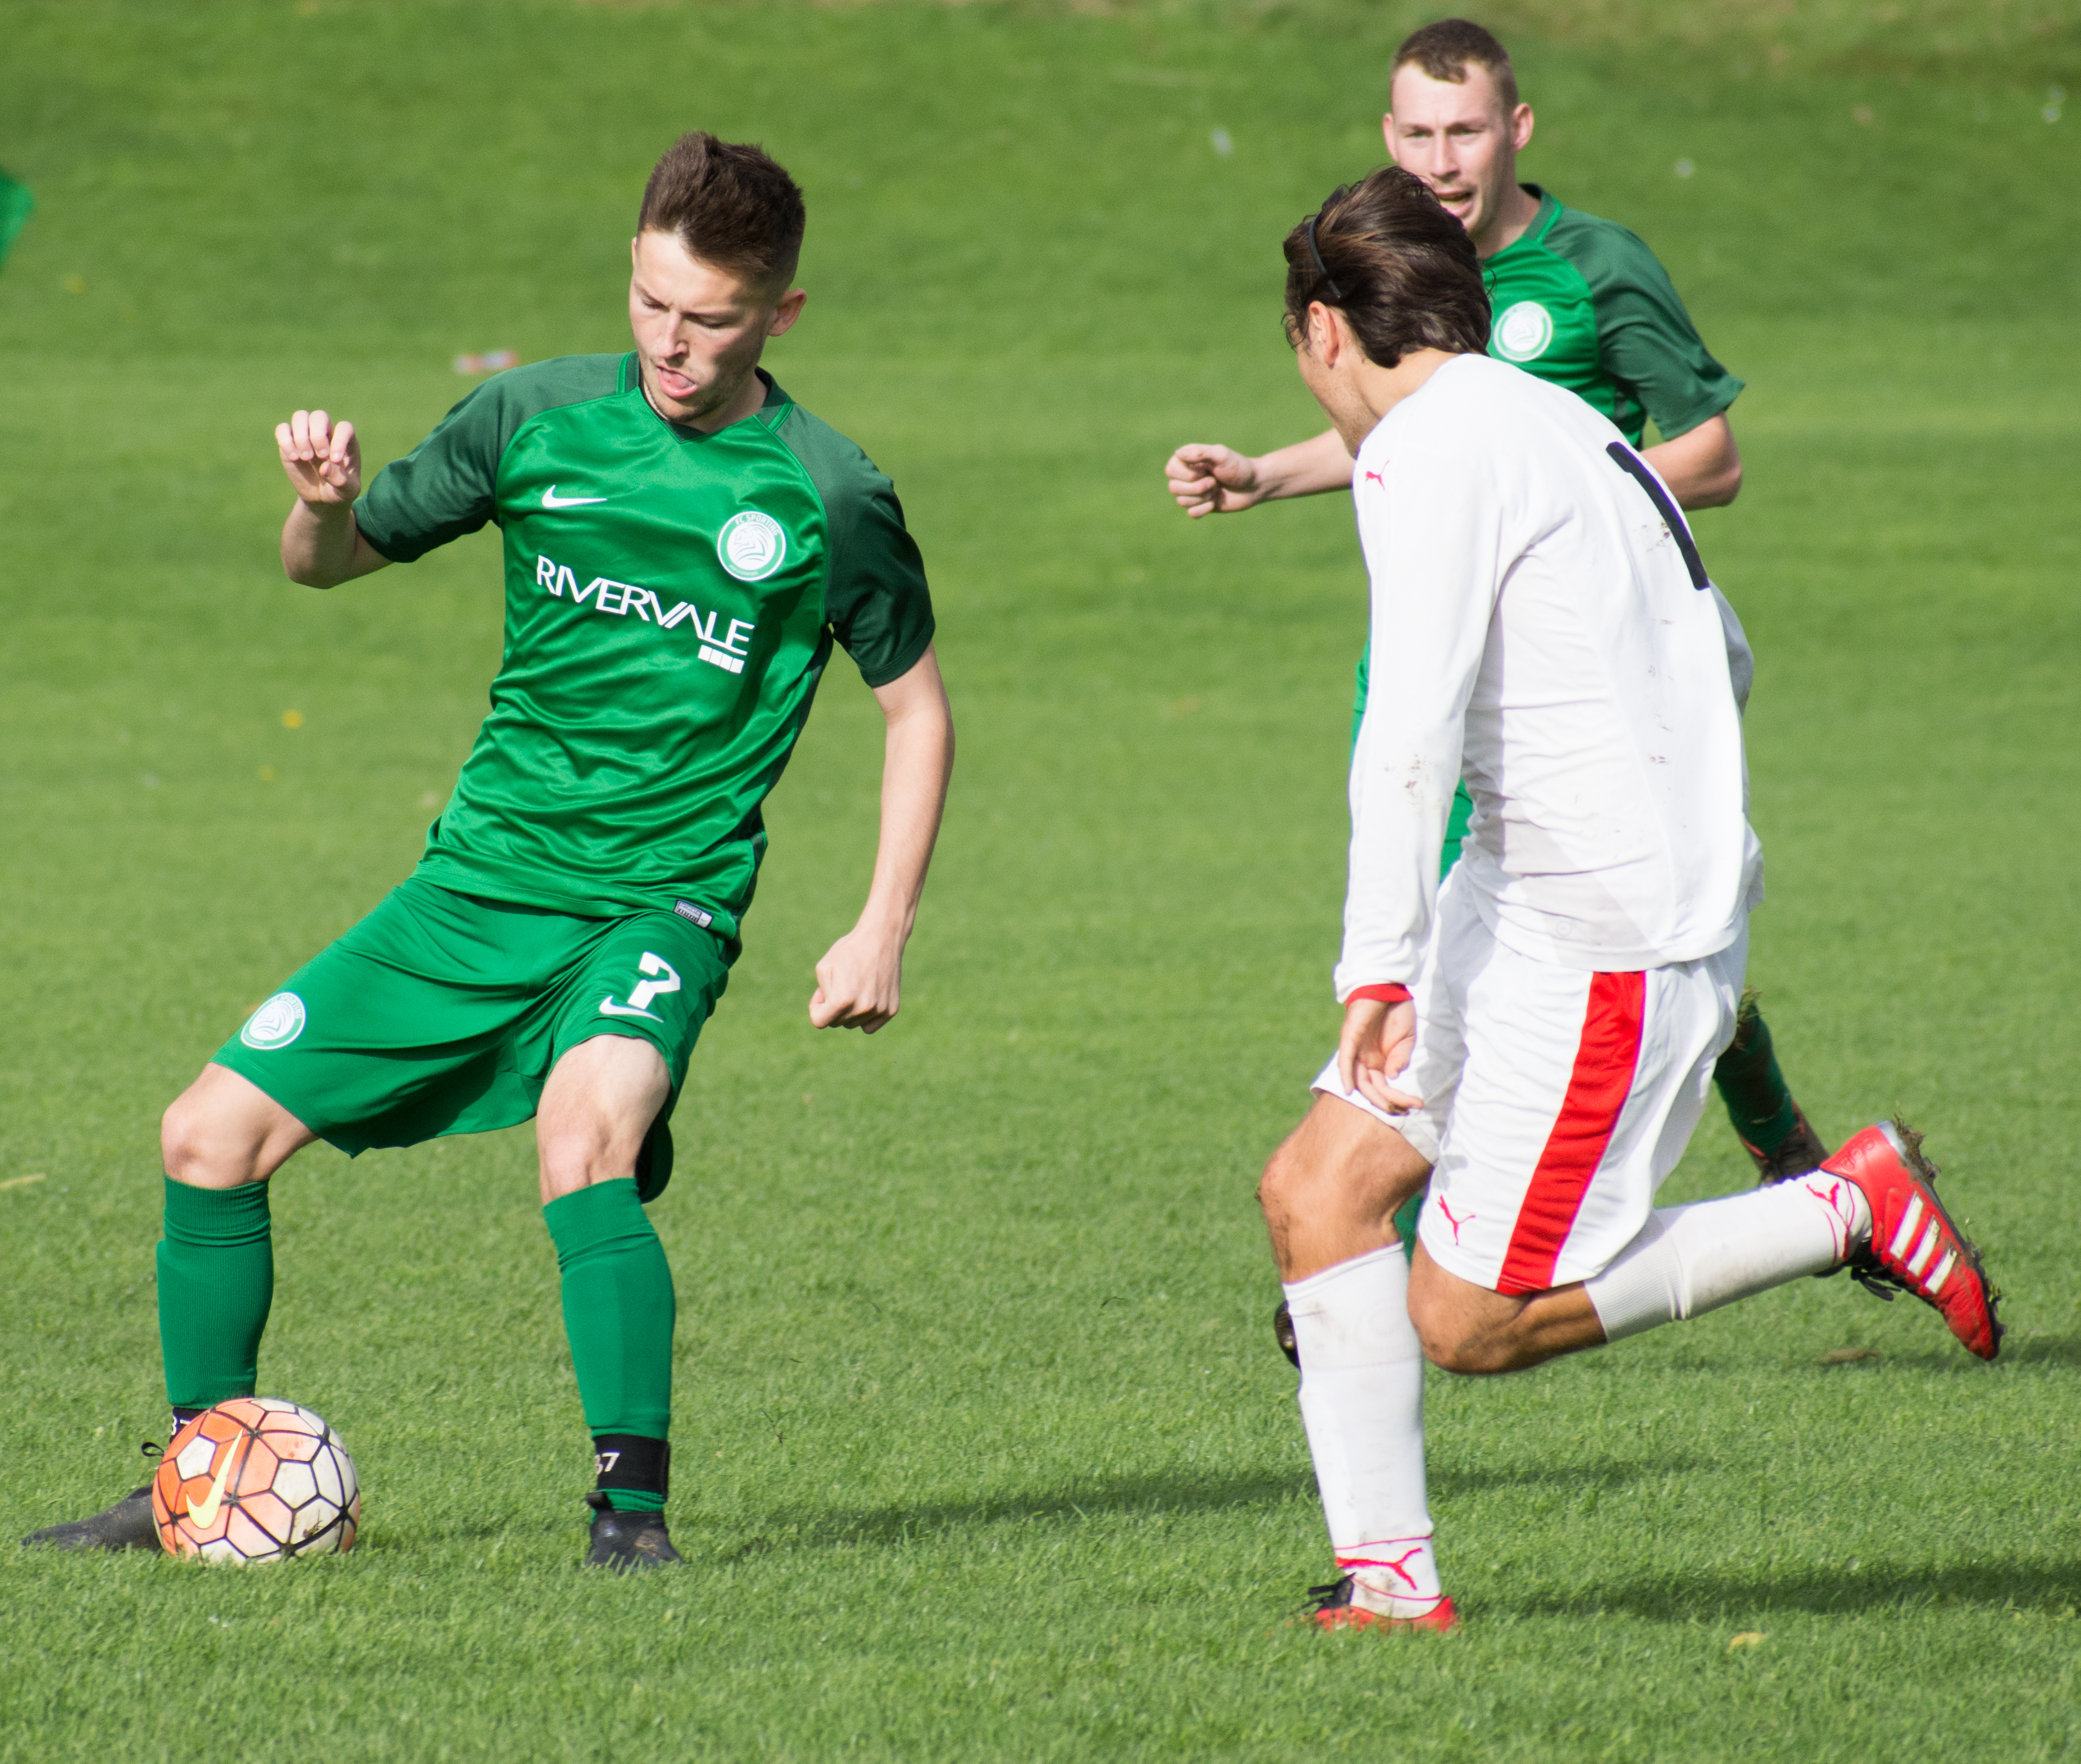 FC Sporting vs Brighton Lights 21.10.17 08